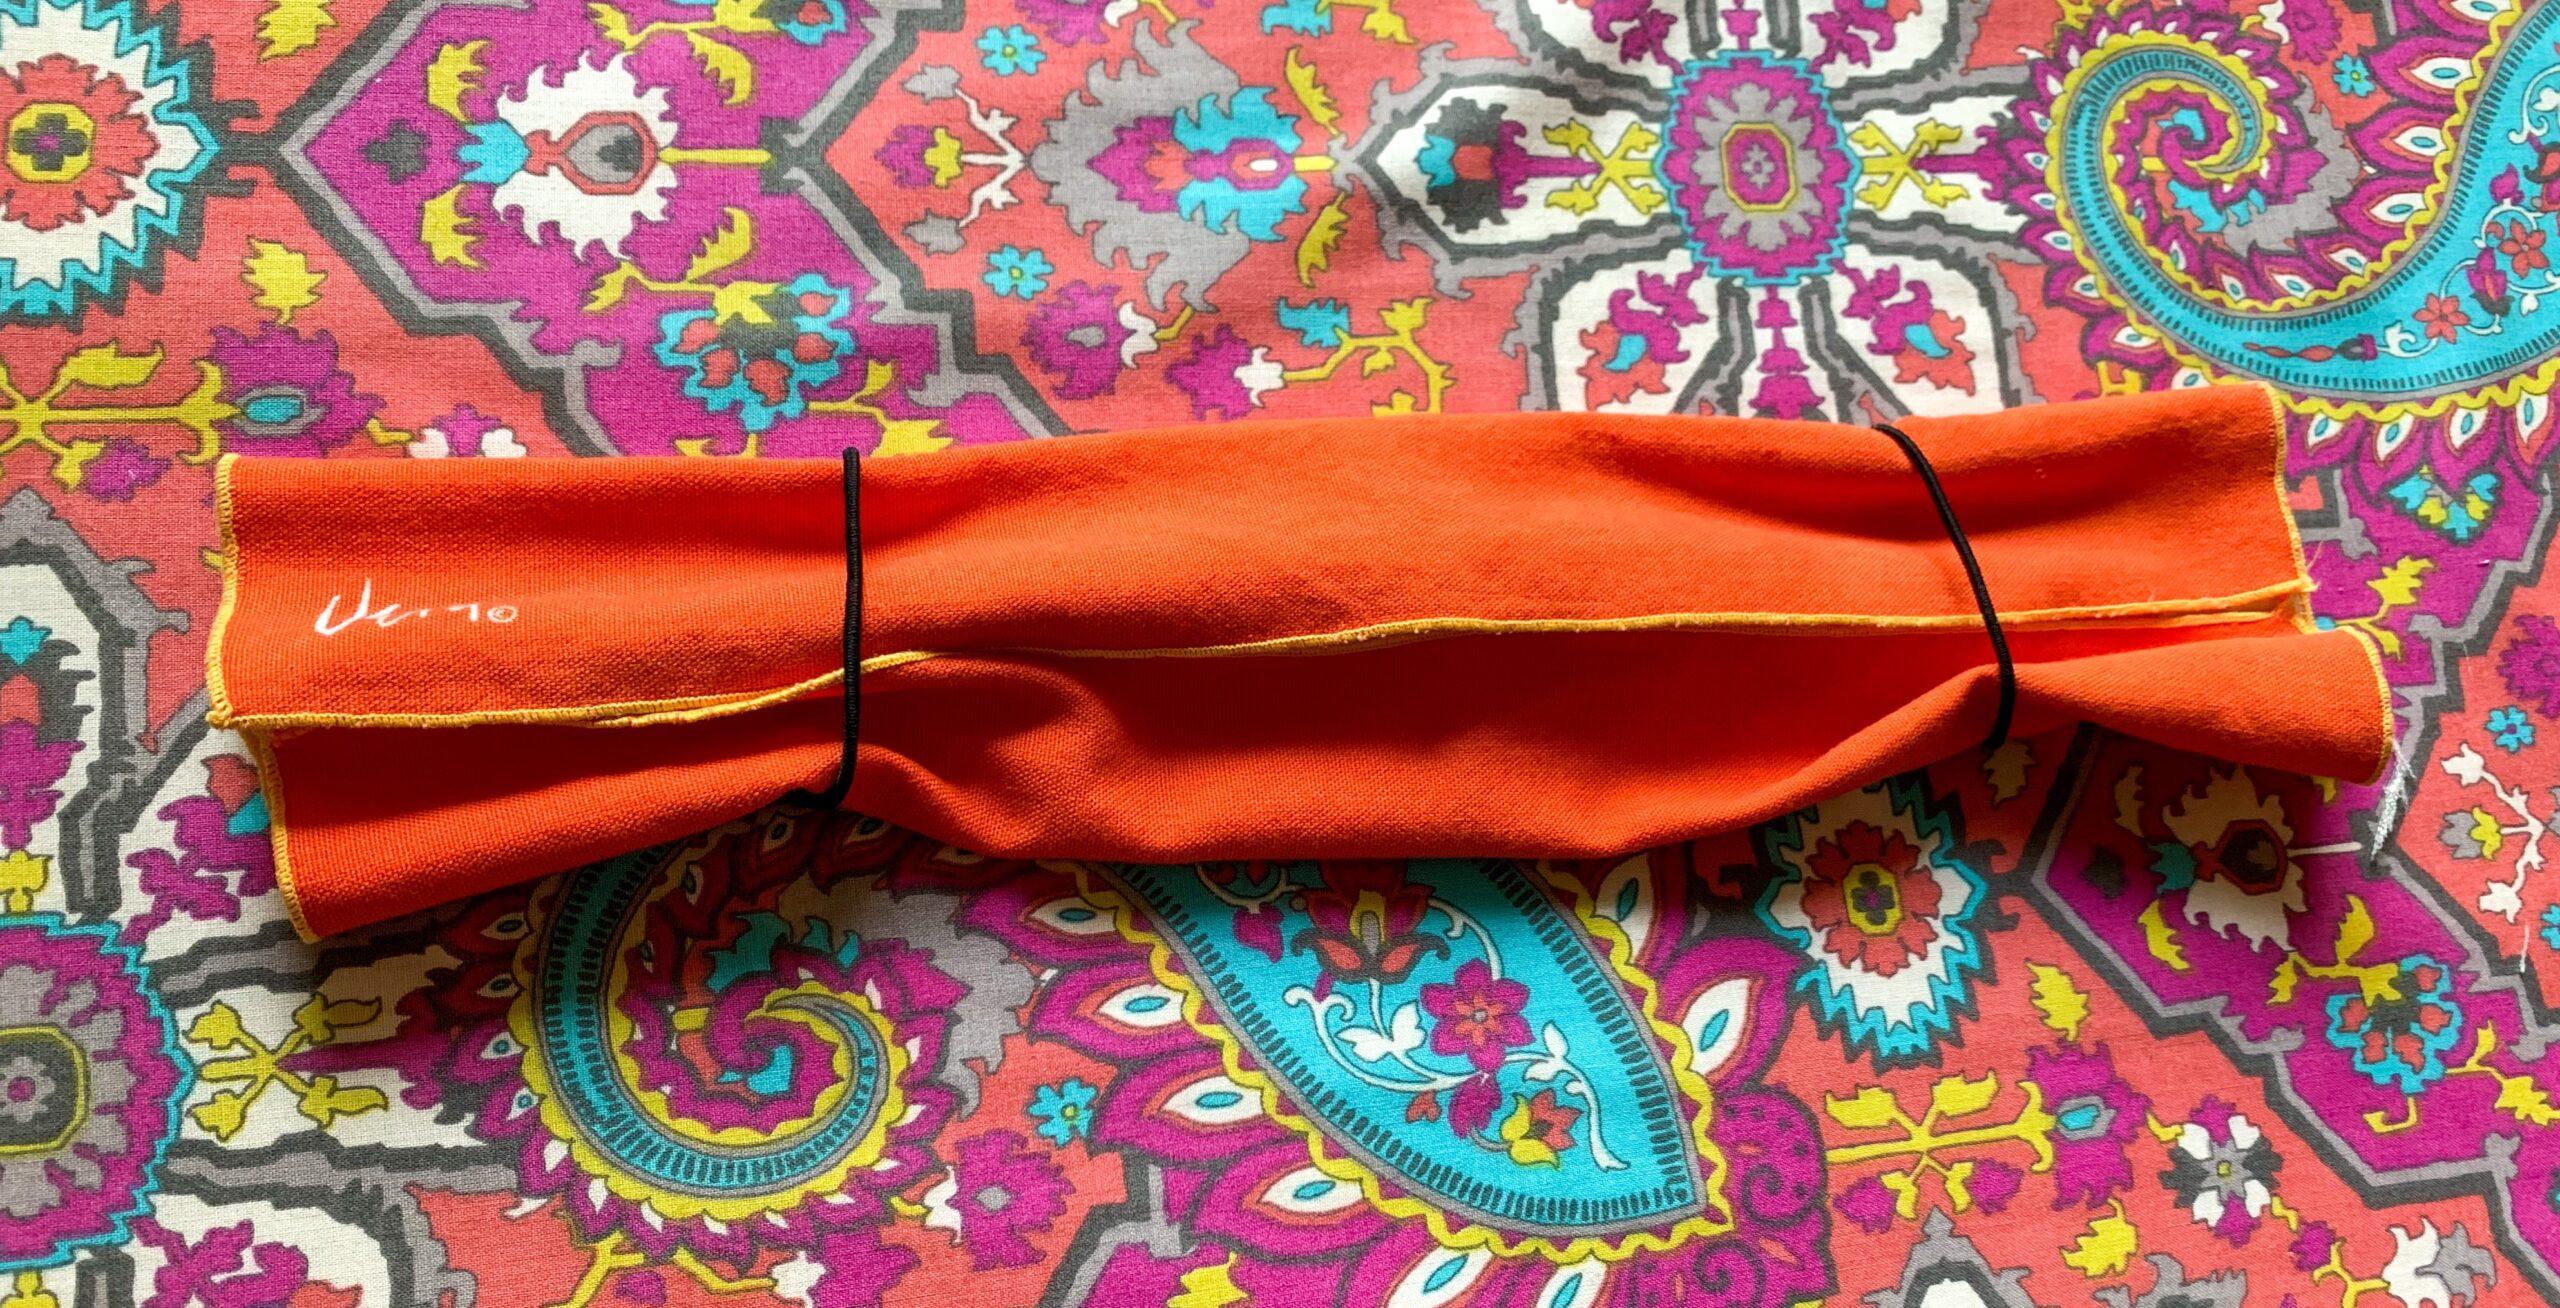 threading hair ties through cloth napkin for diy face mask